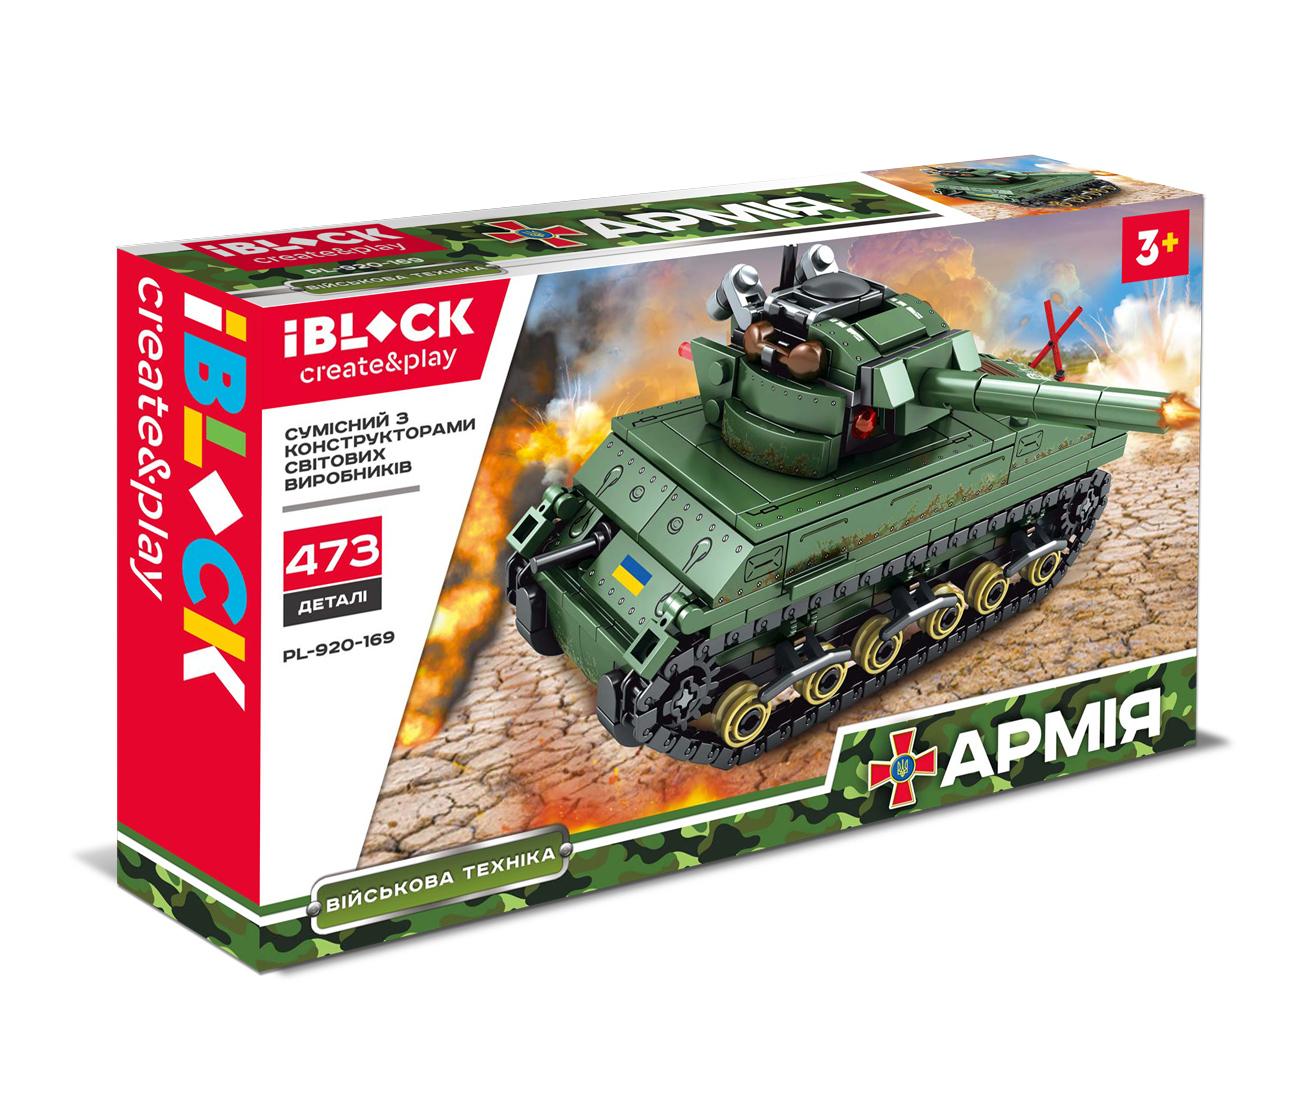 Конструктор IBLOCK Армія PL-920-169